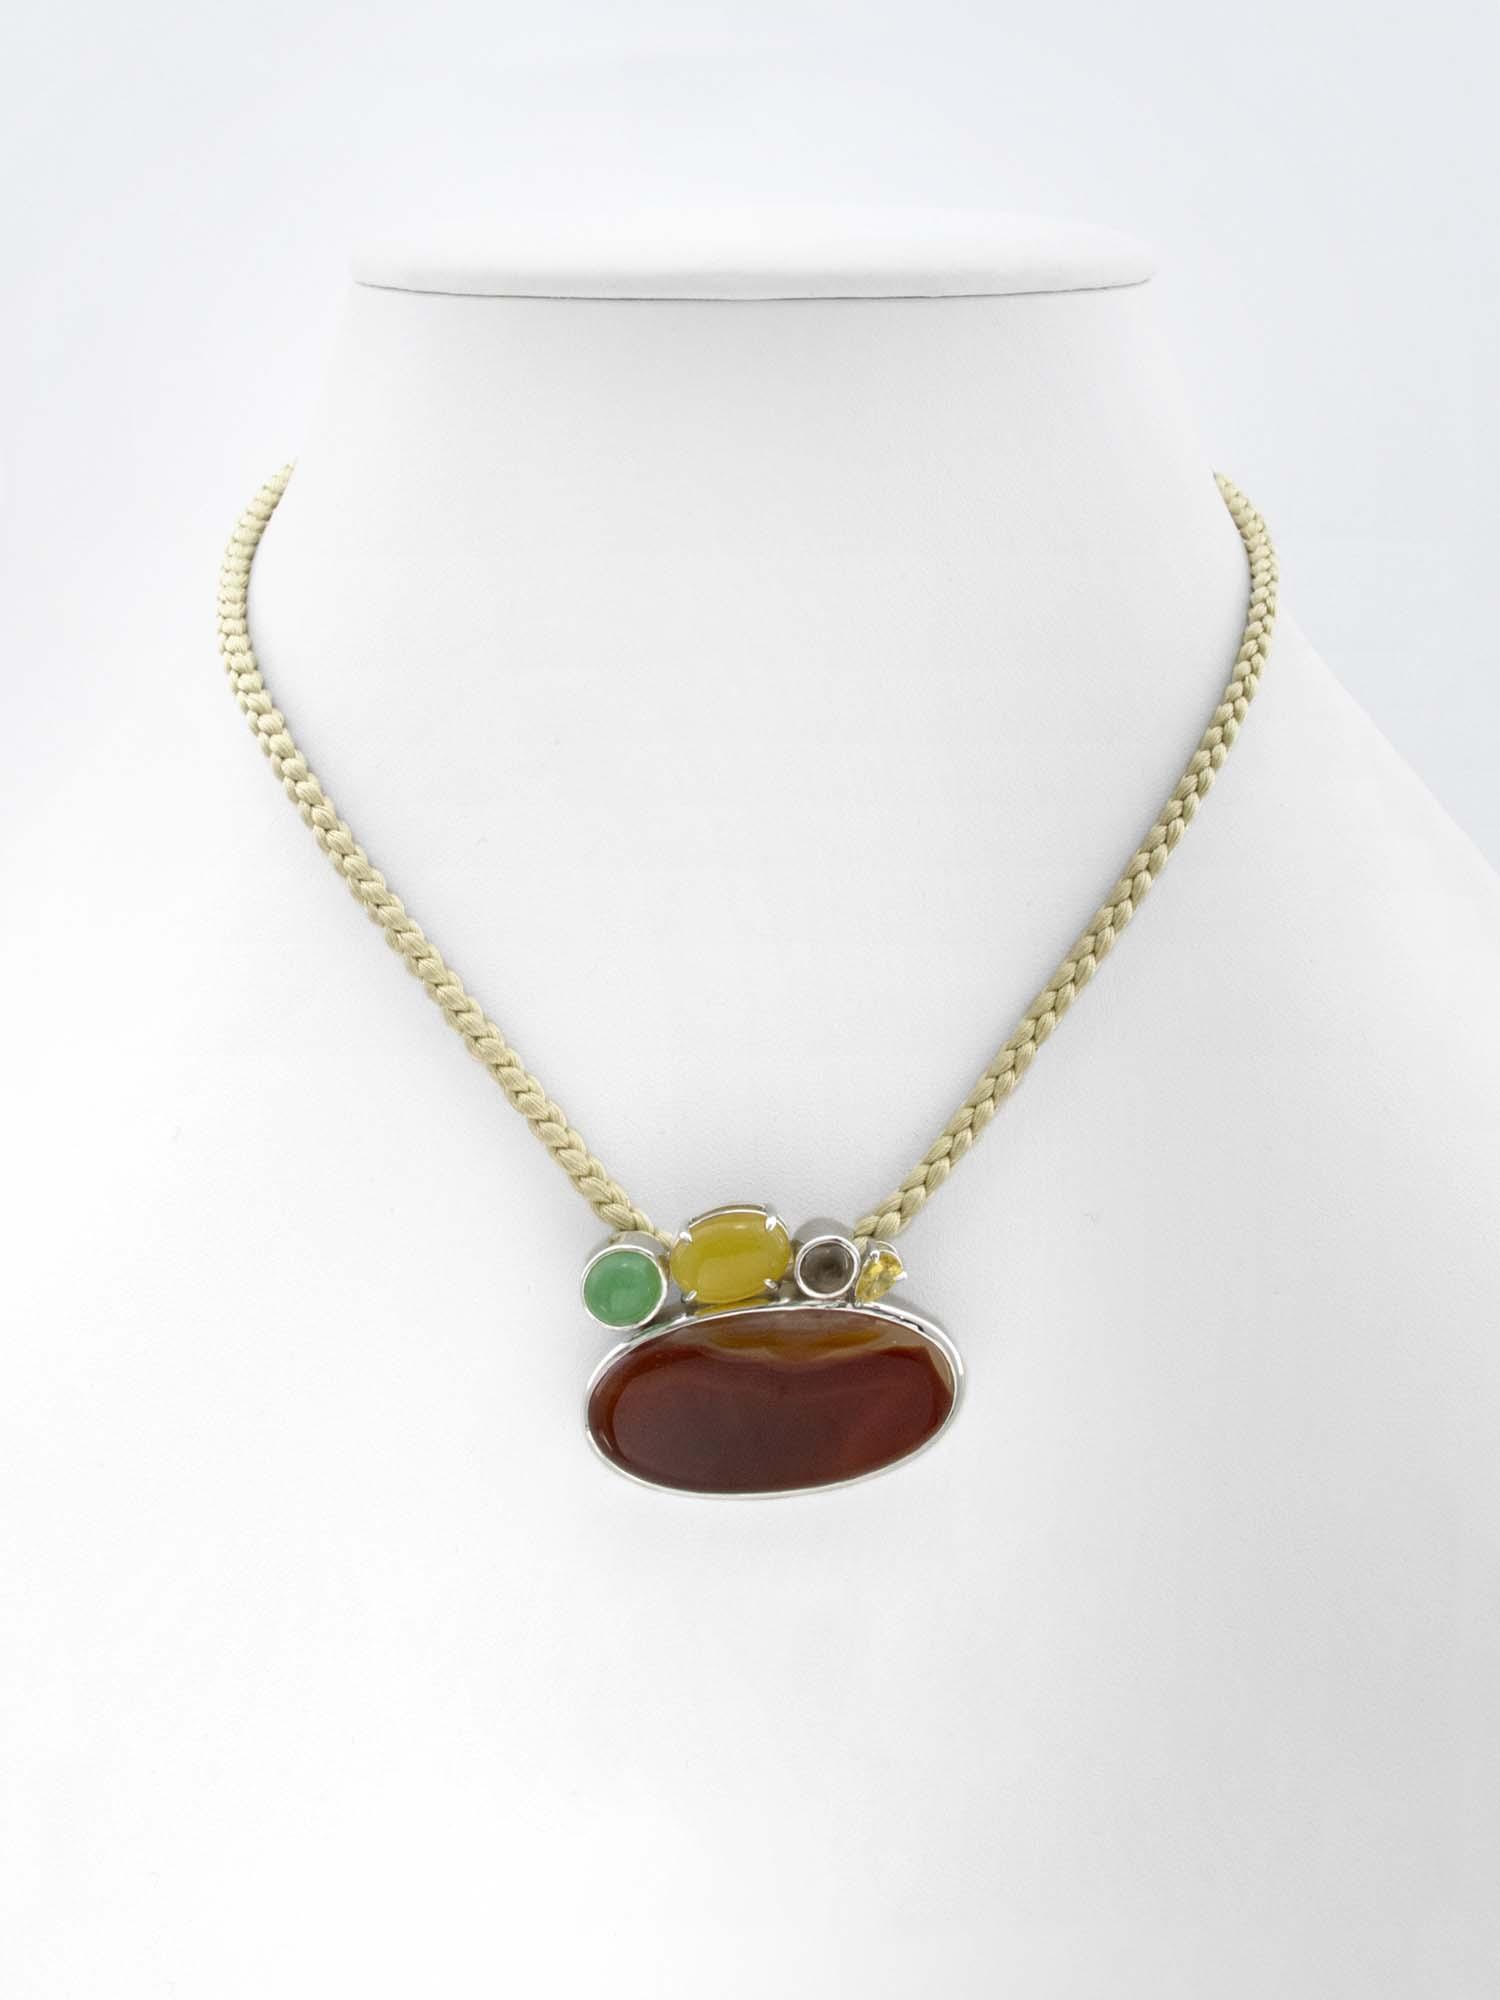 Agate . Chrysoprase . Opale . Quartz